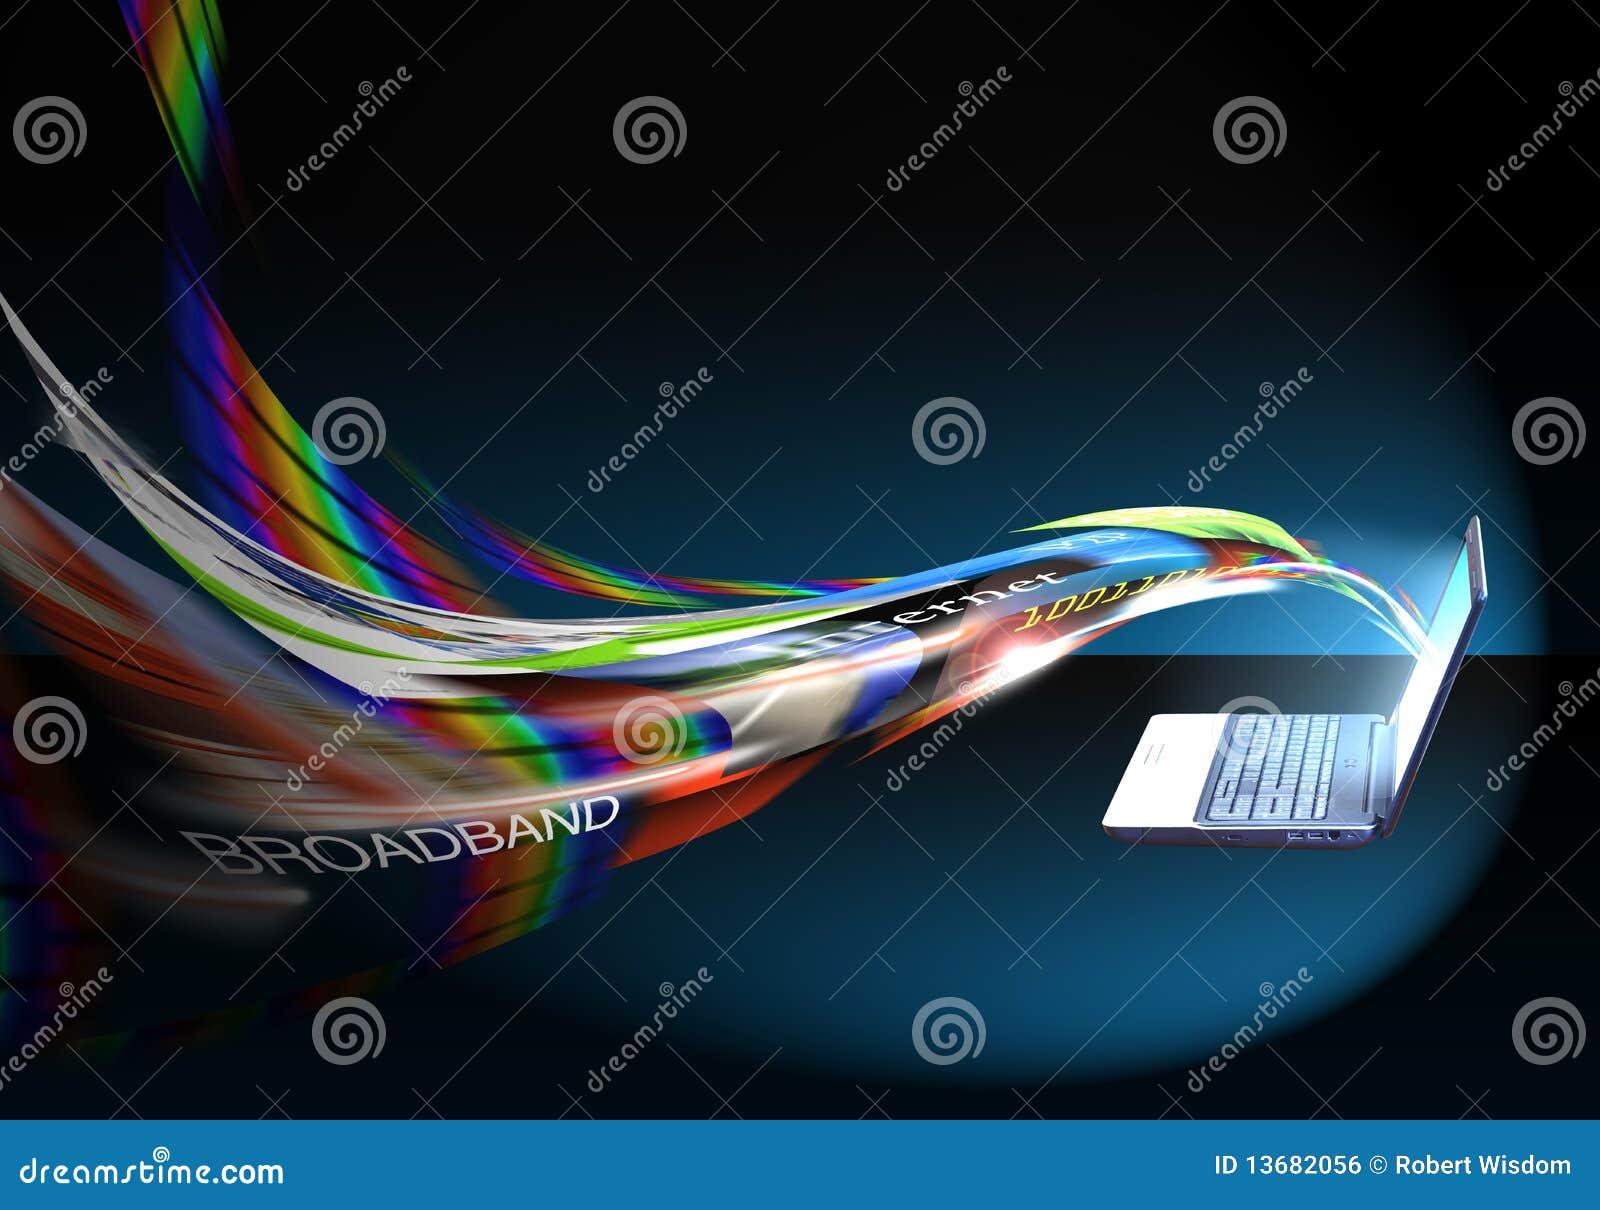 Internet Speed / Broadband